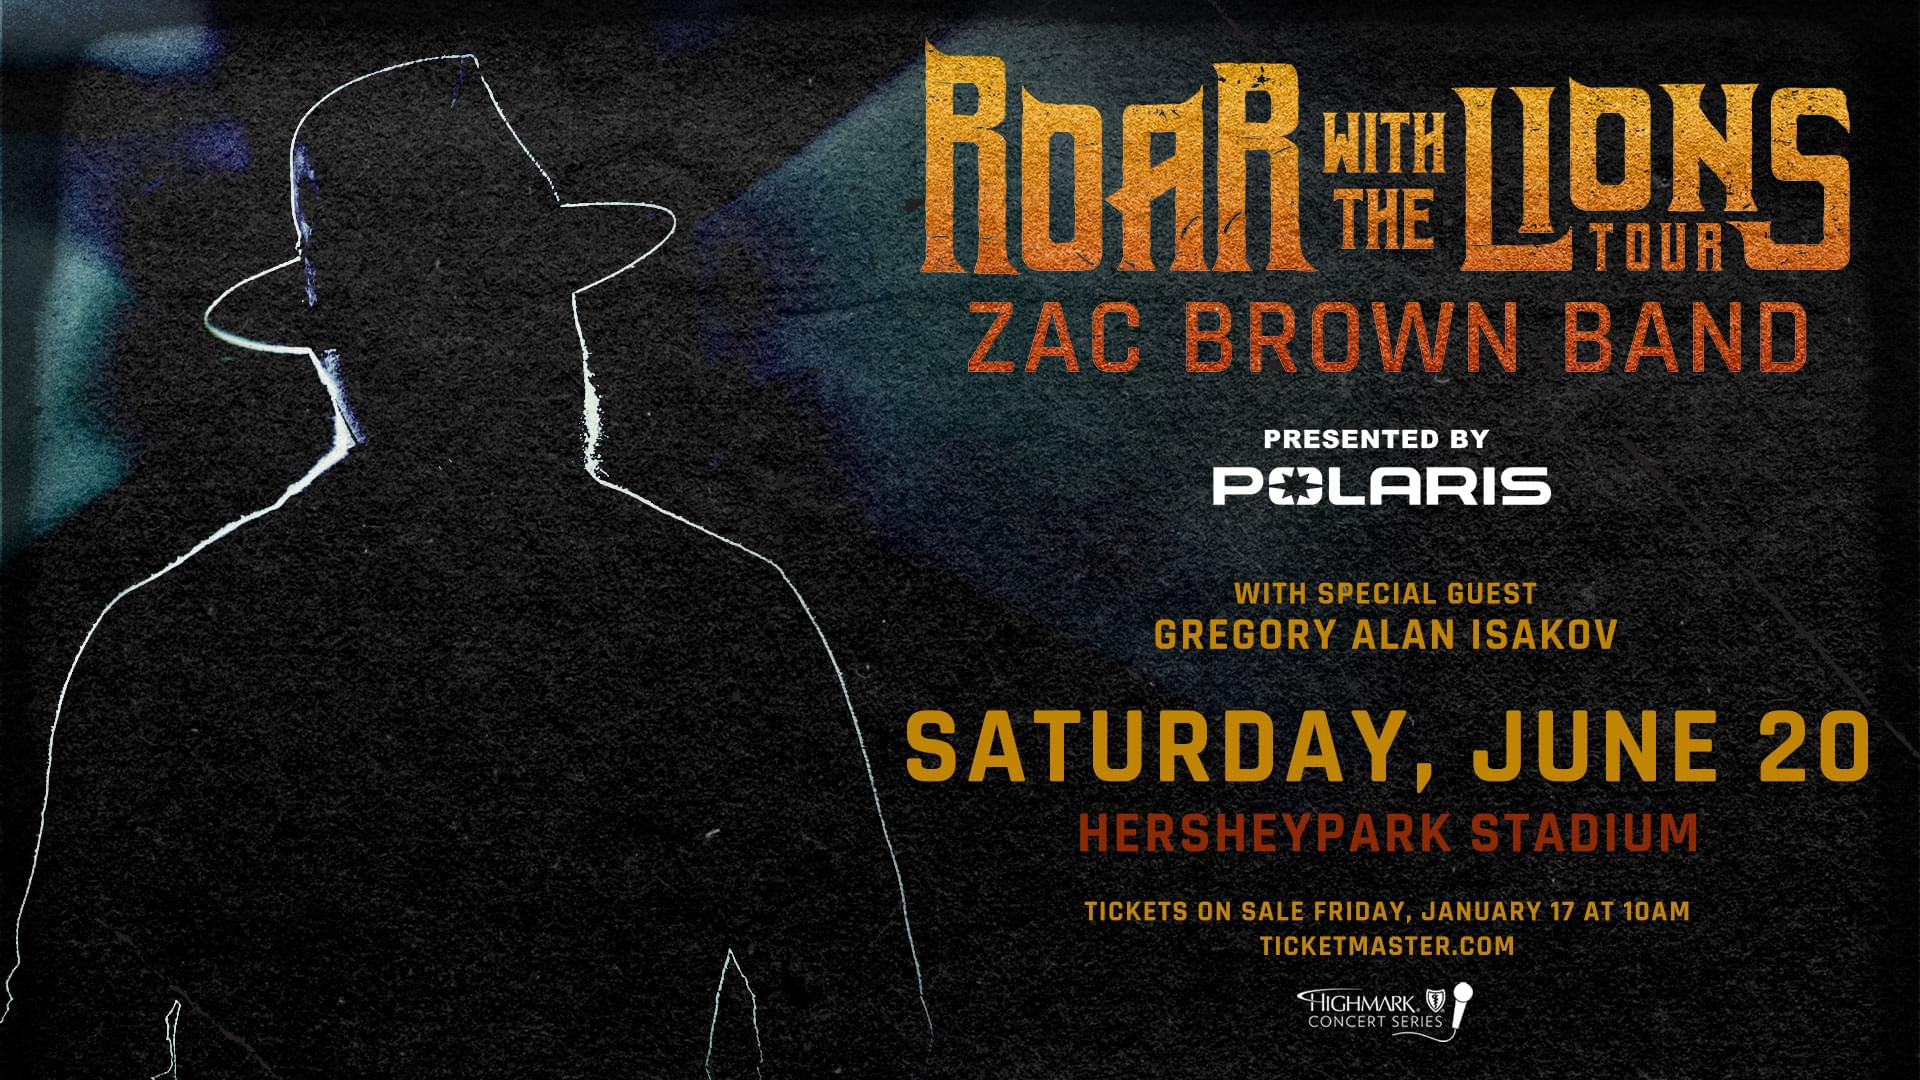 Zac Brown Band Giveaway!